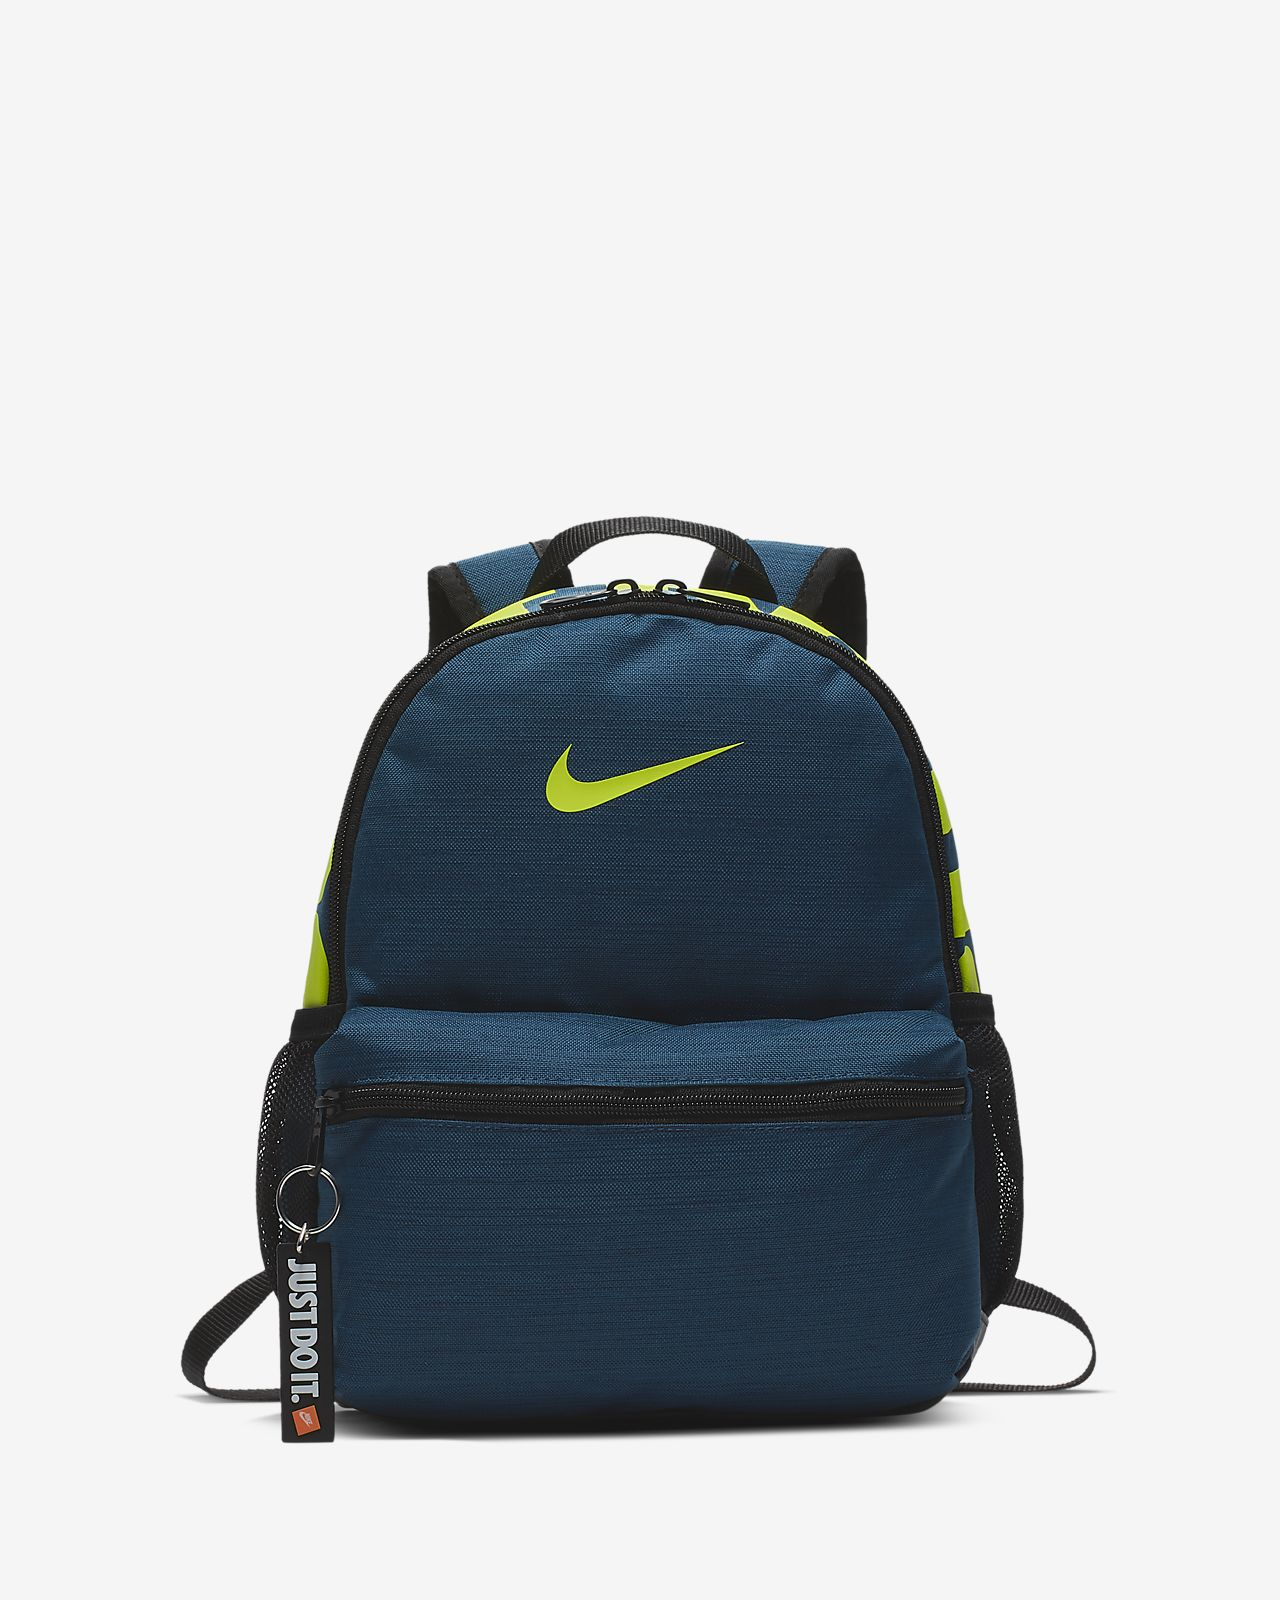 f76739c8fa Sac à dos Nike Brasilia Just Do It pour Enfant (Mini). Nike.com FR